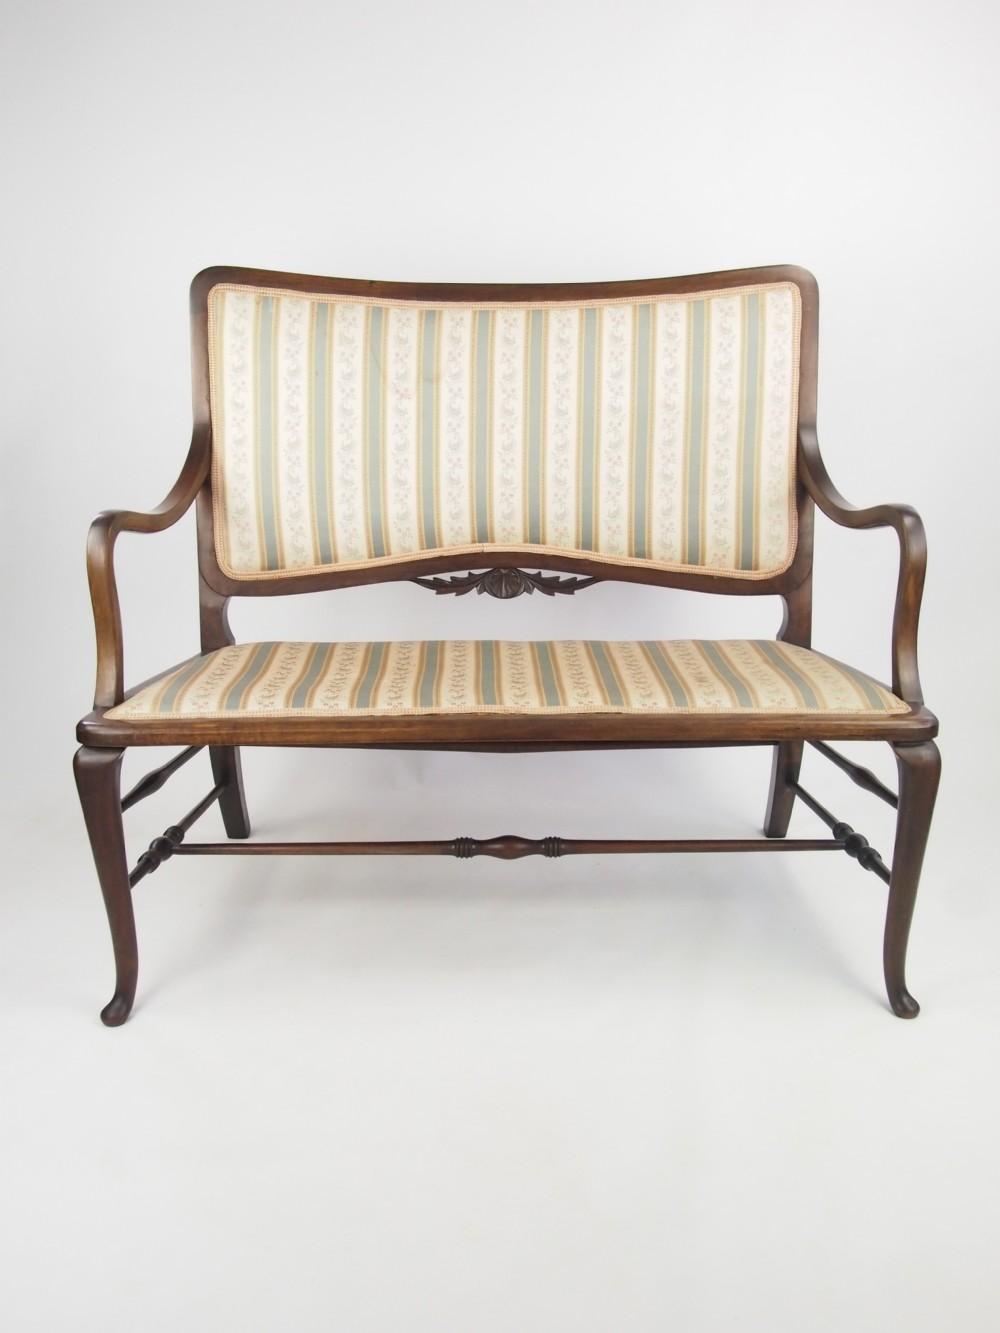 Small antique edwardian sofa 270663 for Antikes sofa gebraucht